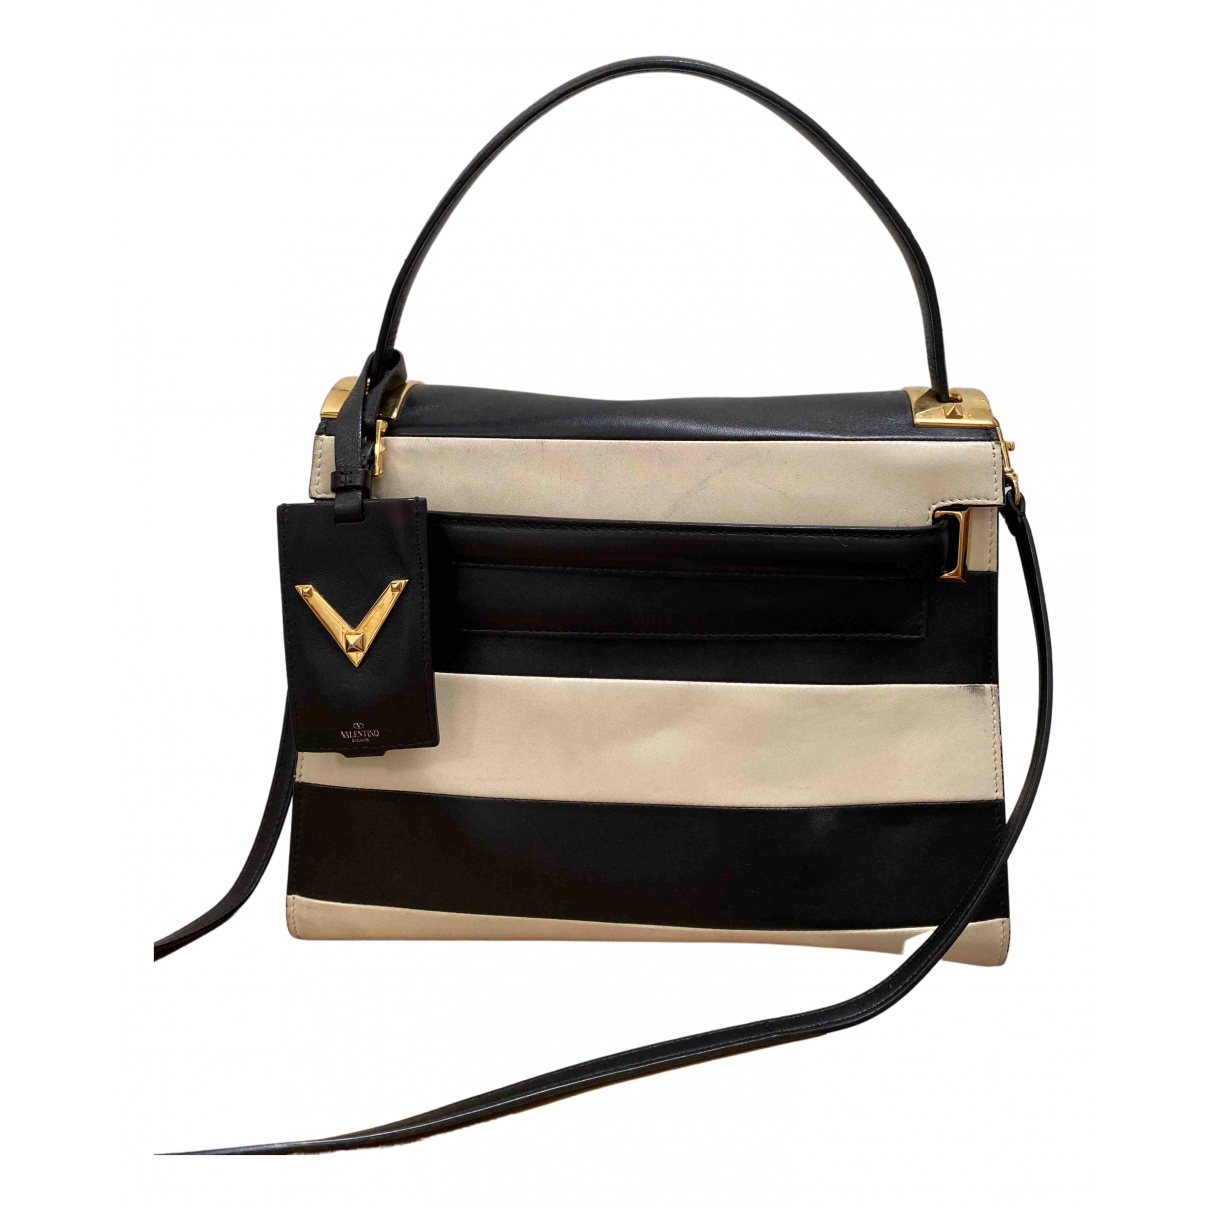 Valentino Garavani - Sac a main My Rockstud pour femme en cuir - noir